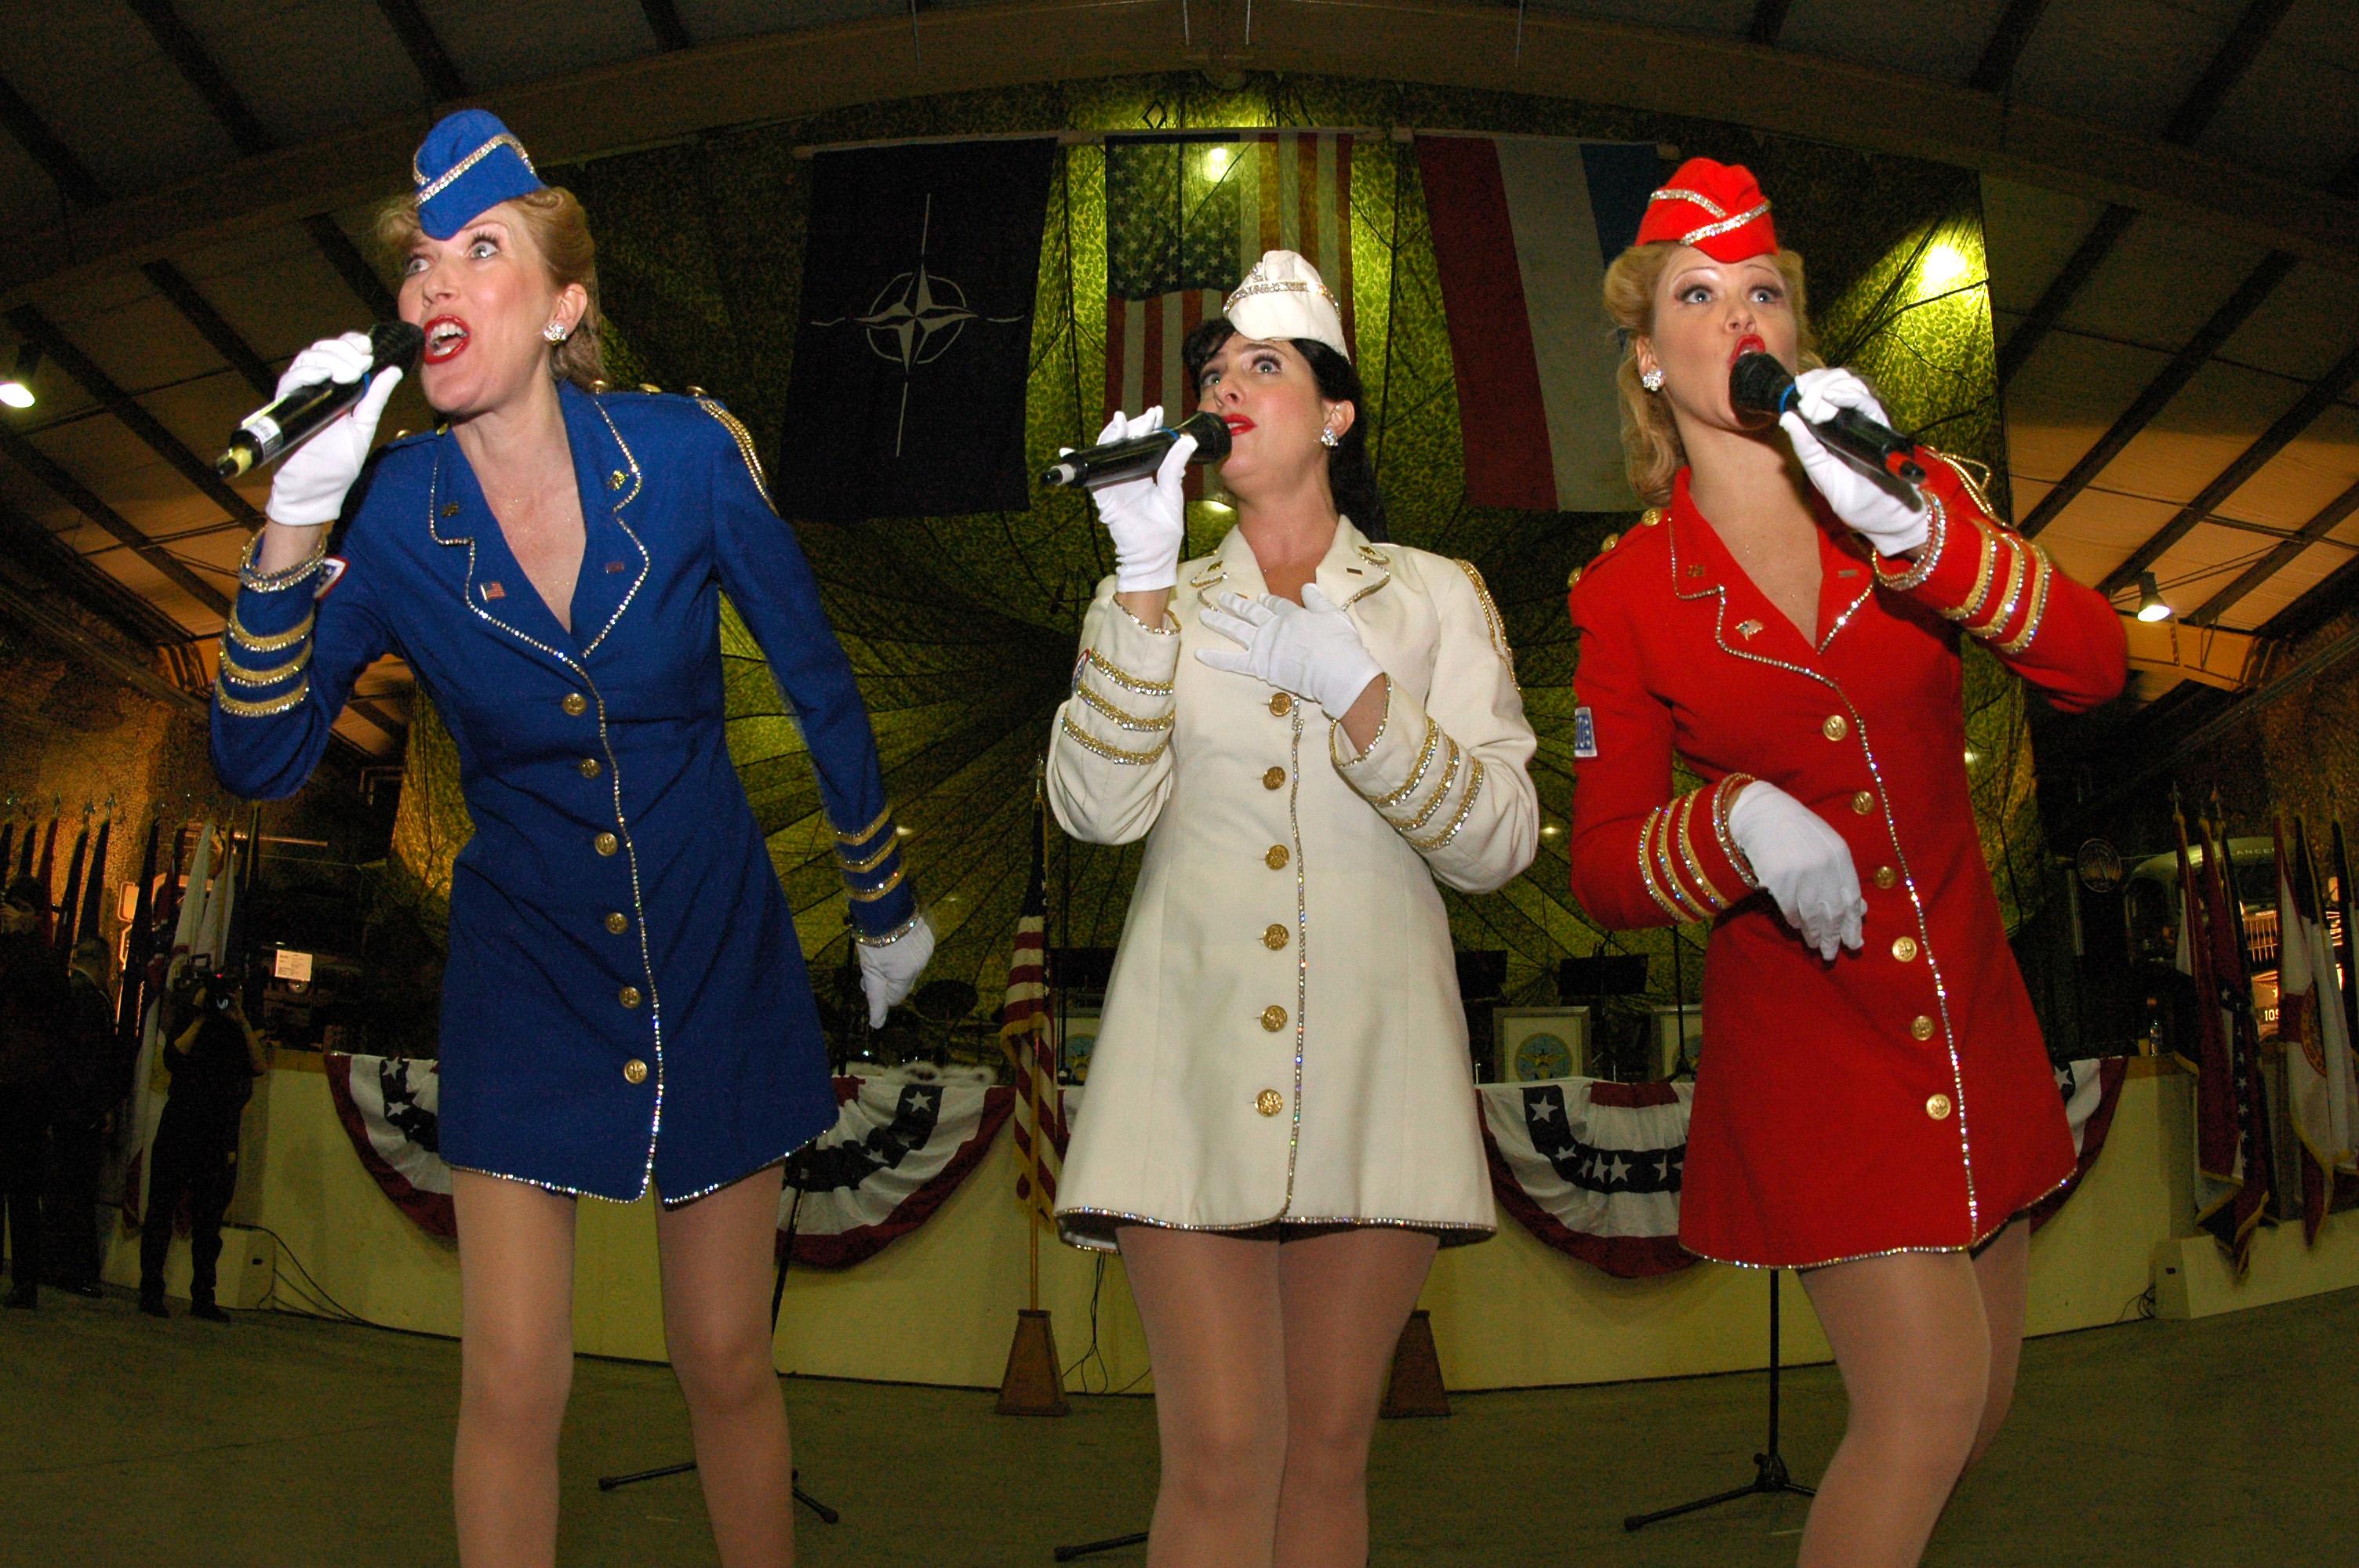 FileUS Navy 041216 N 3236B 025 The New York Based Liberty